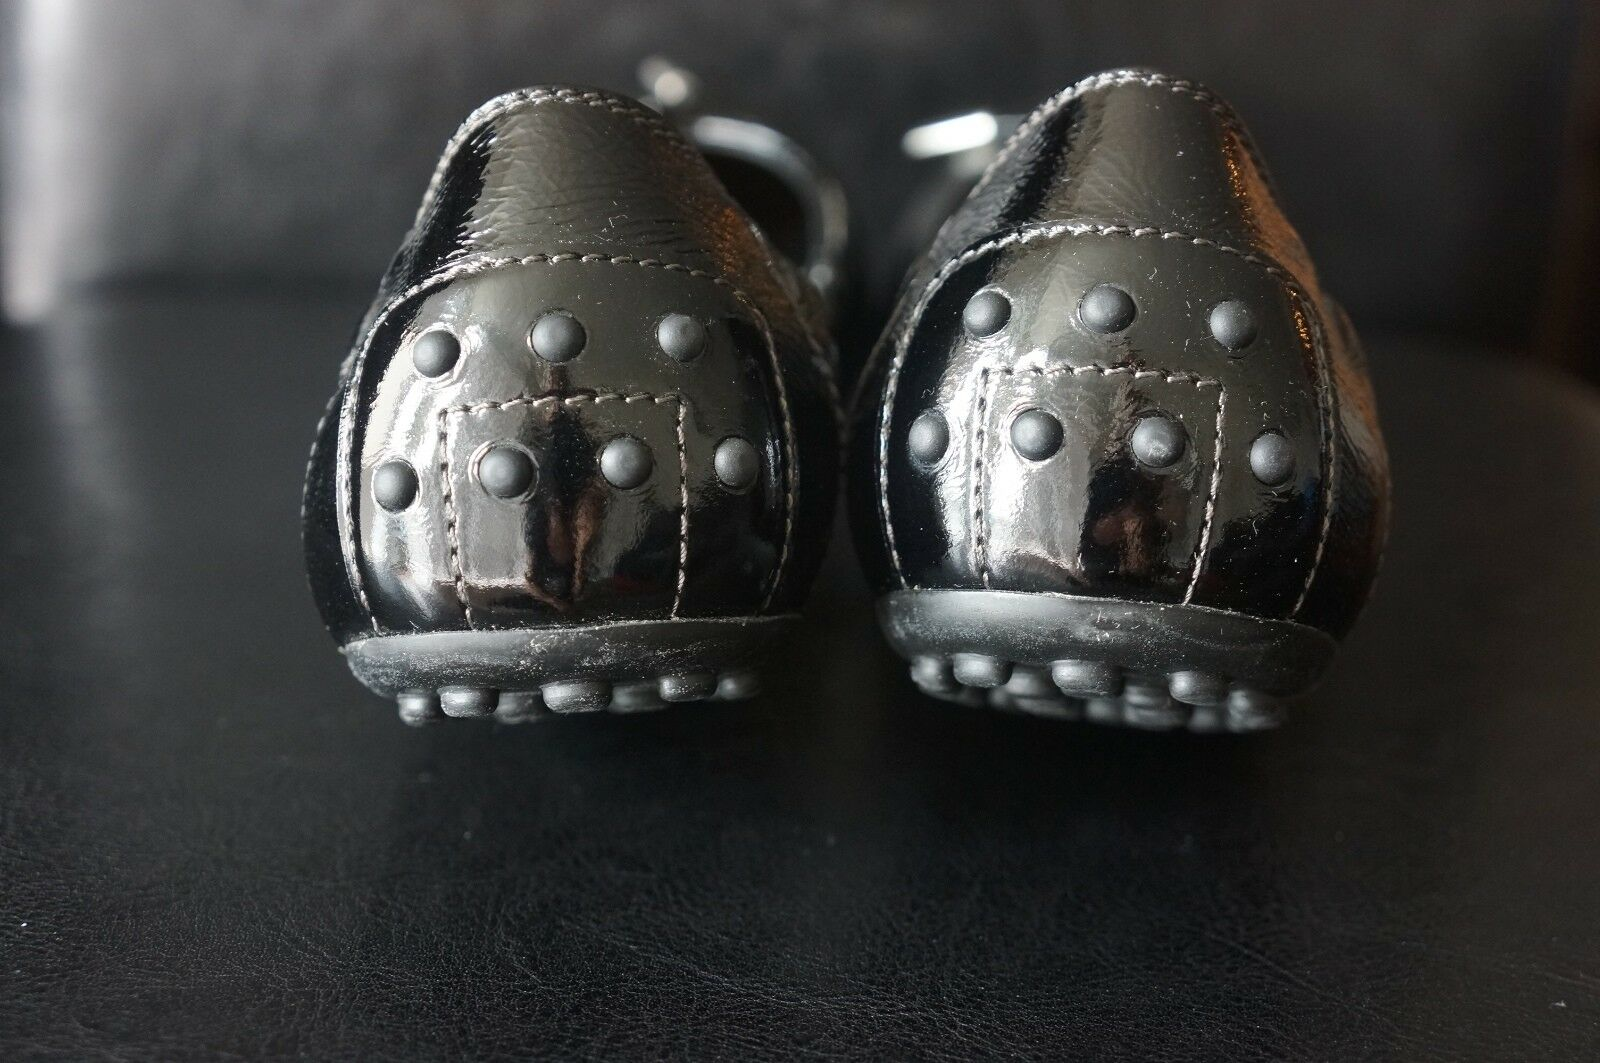 NEW Tod's Black Black Black Patent Leather Ballerina Flats Sz 39.5  US 9.5 642446